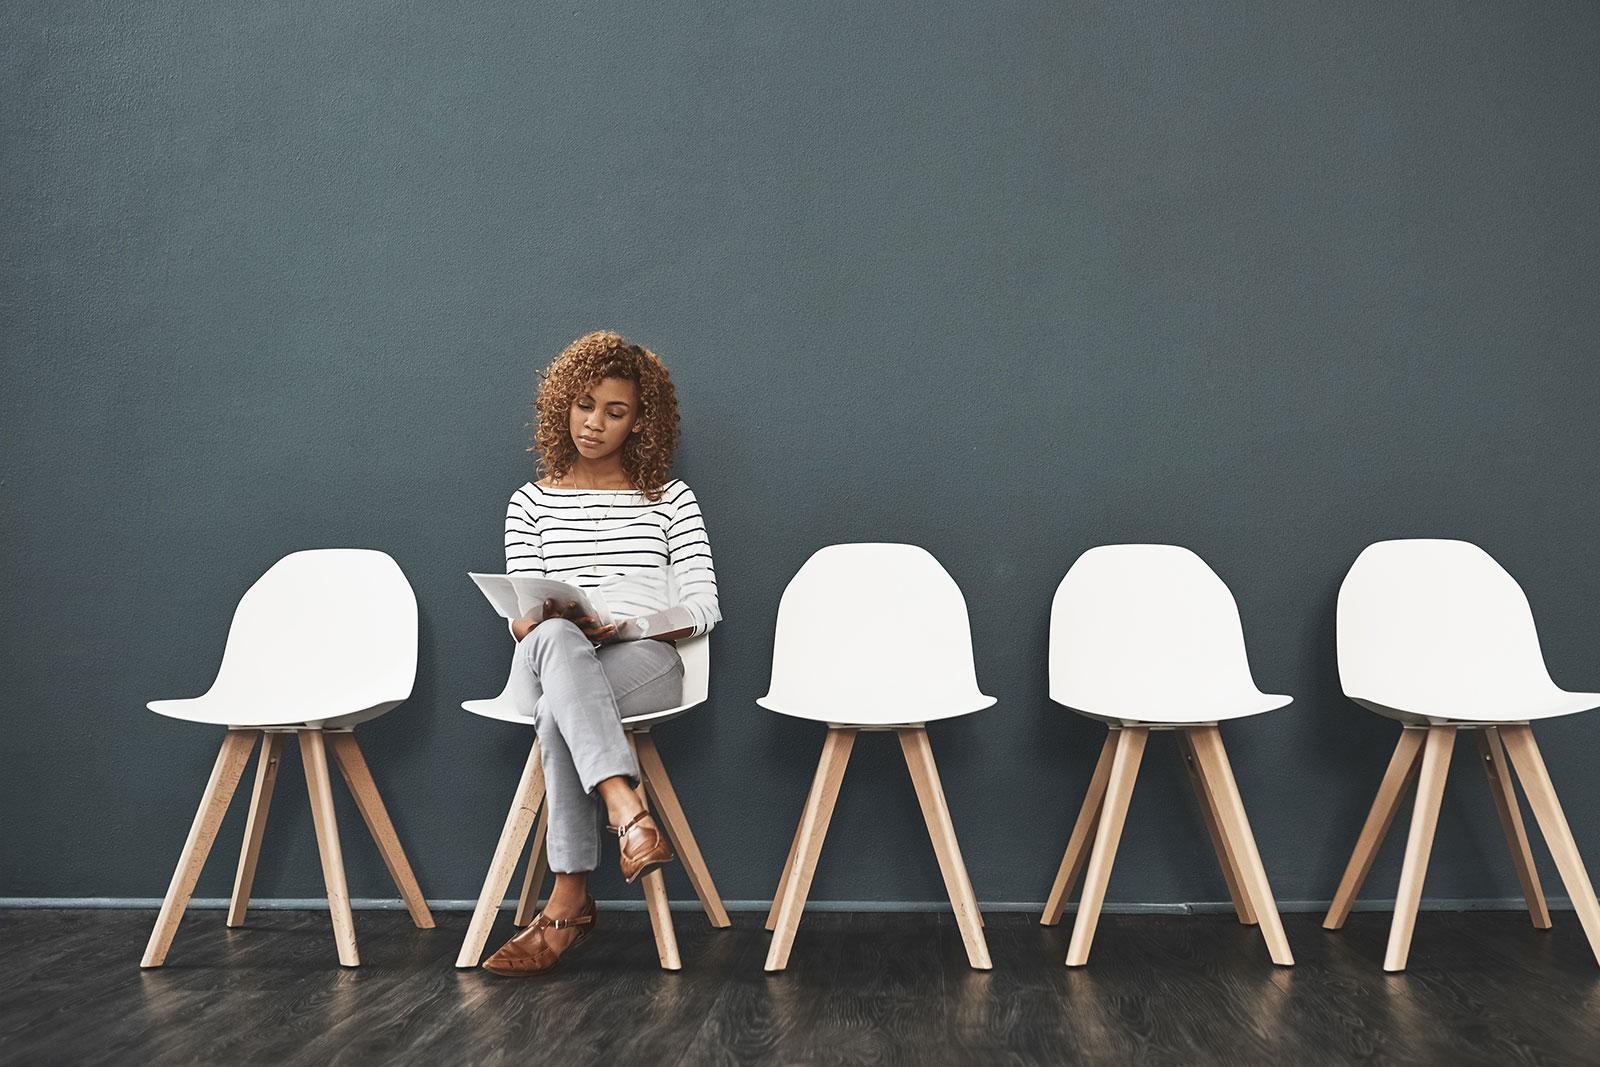 8 Ways Educators Can Benefit from the Digital Skills Shortage